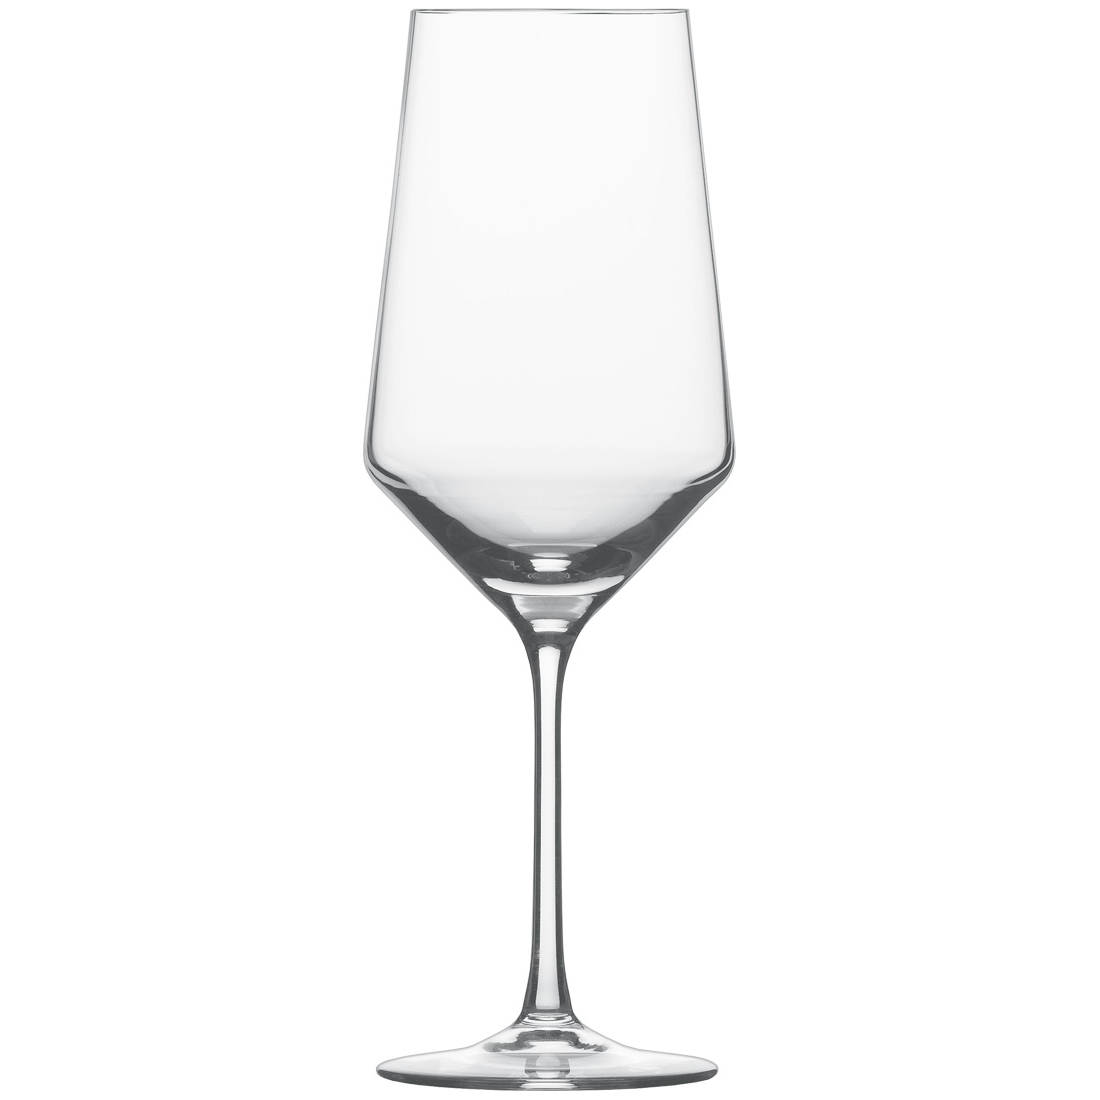 Фото - Набор бокалов для красного вина Schott Zwiesel Pure 680 мл 2 шт набор бокалов для красного вина schott zwiesel prizma 561 мл 6 шт